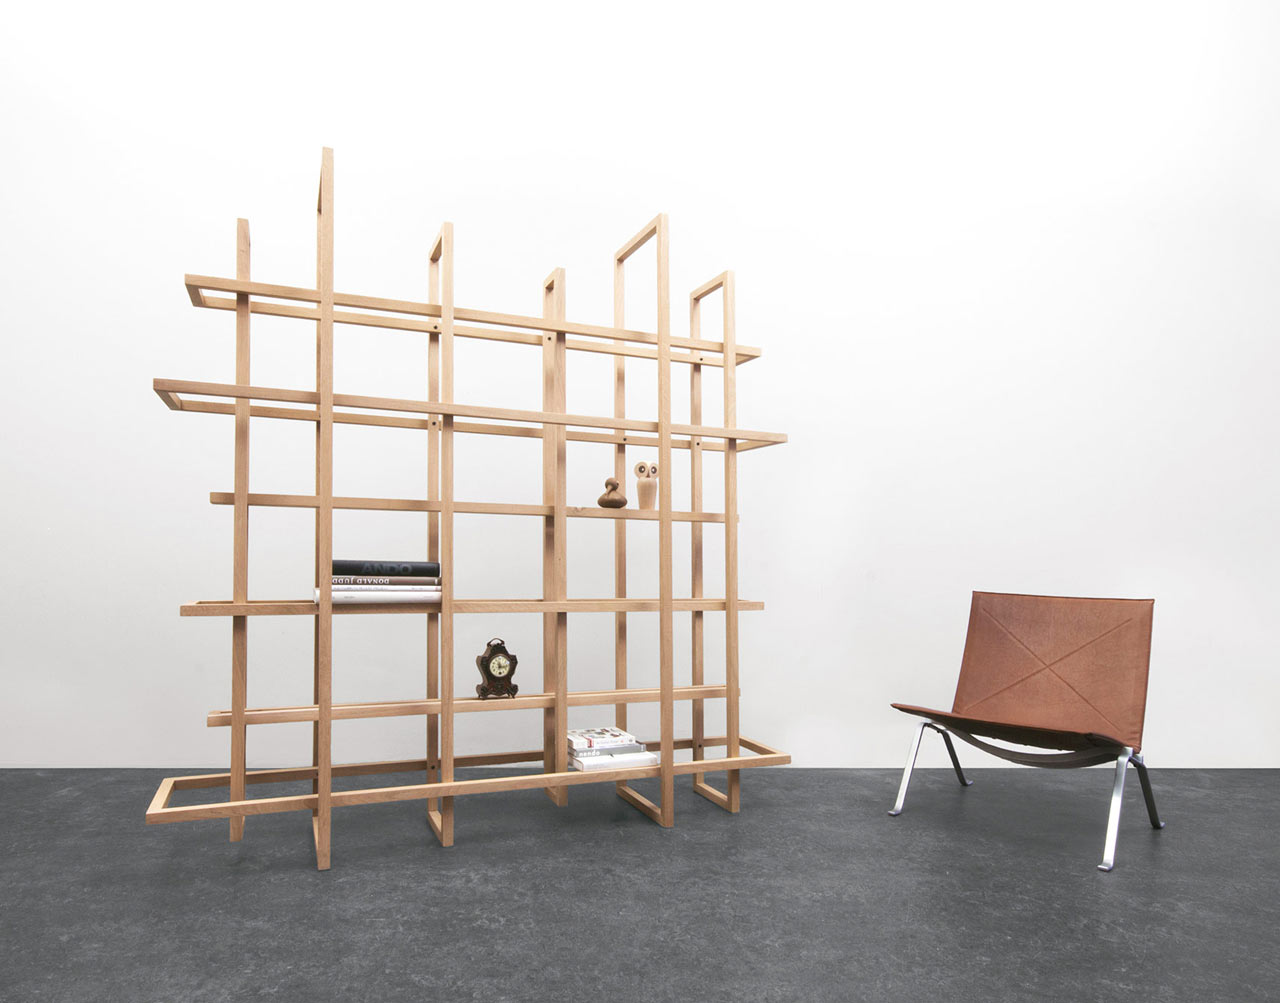 Frames 2.0: A Bookcase or a Room Divider